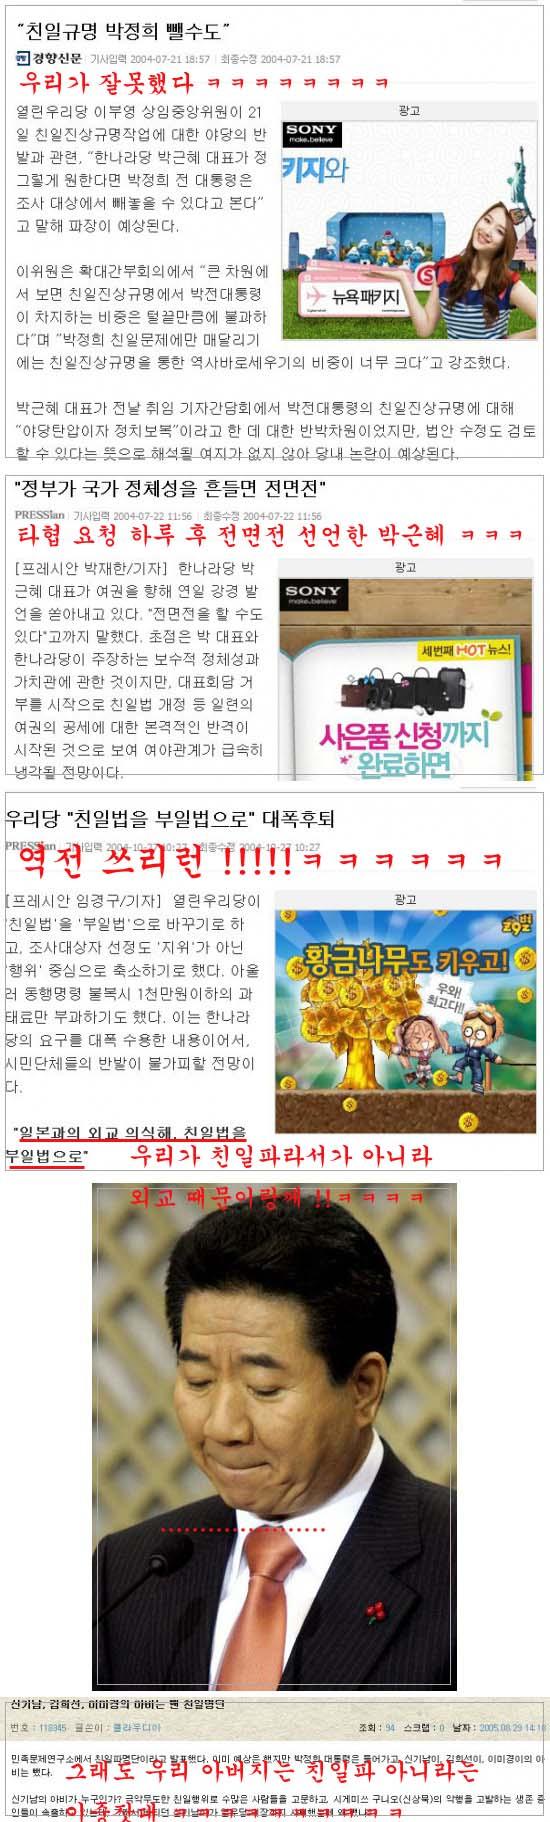 4.jpg 대한민국 그 유명한 친일대첩.JPG